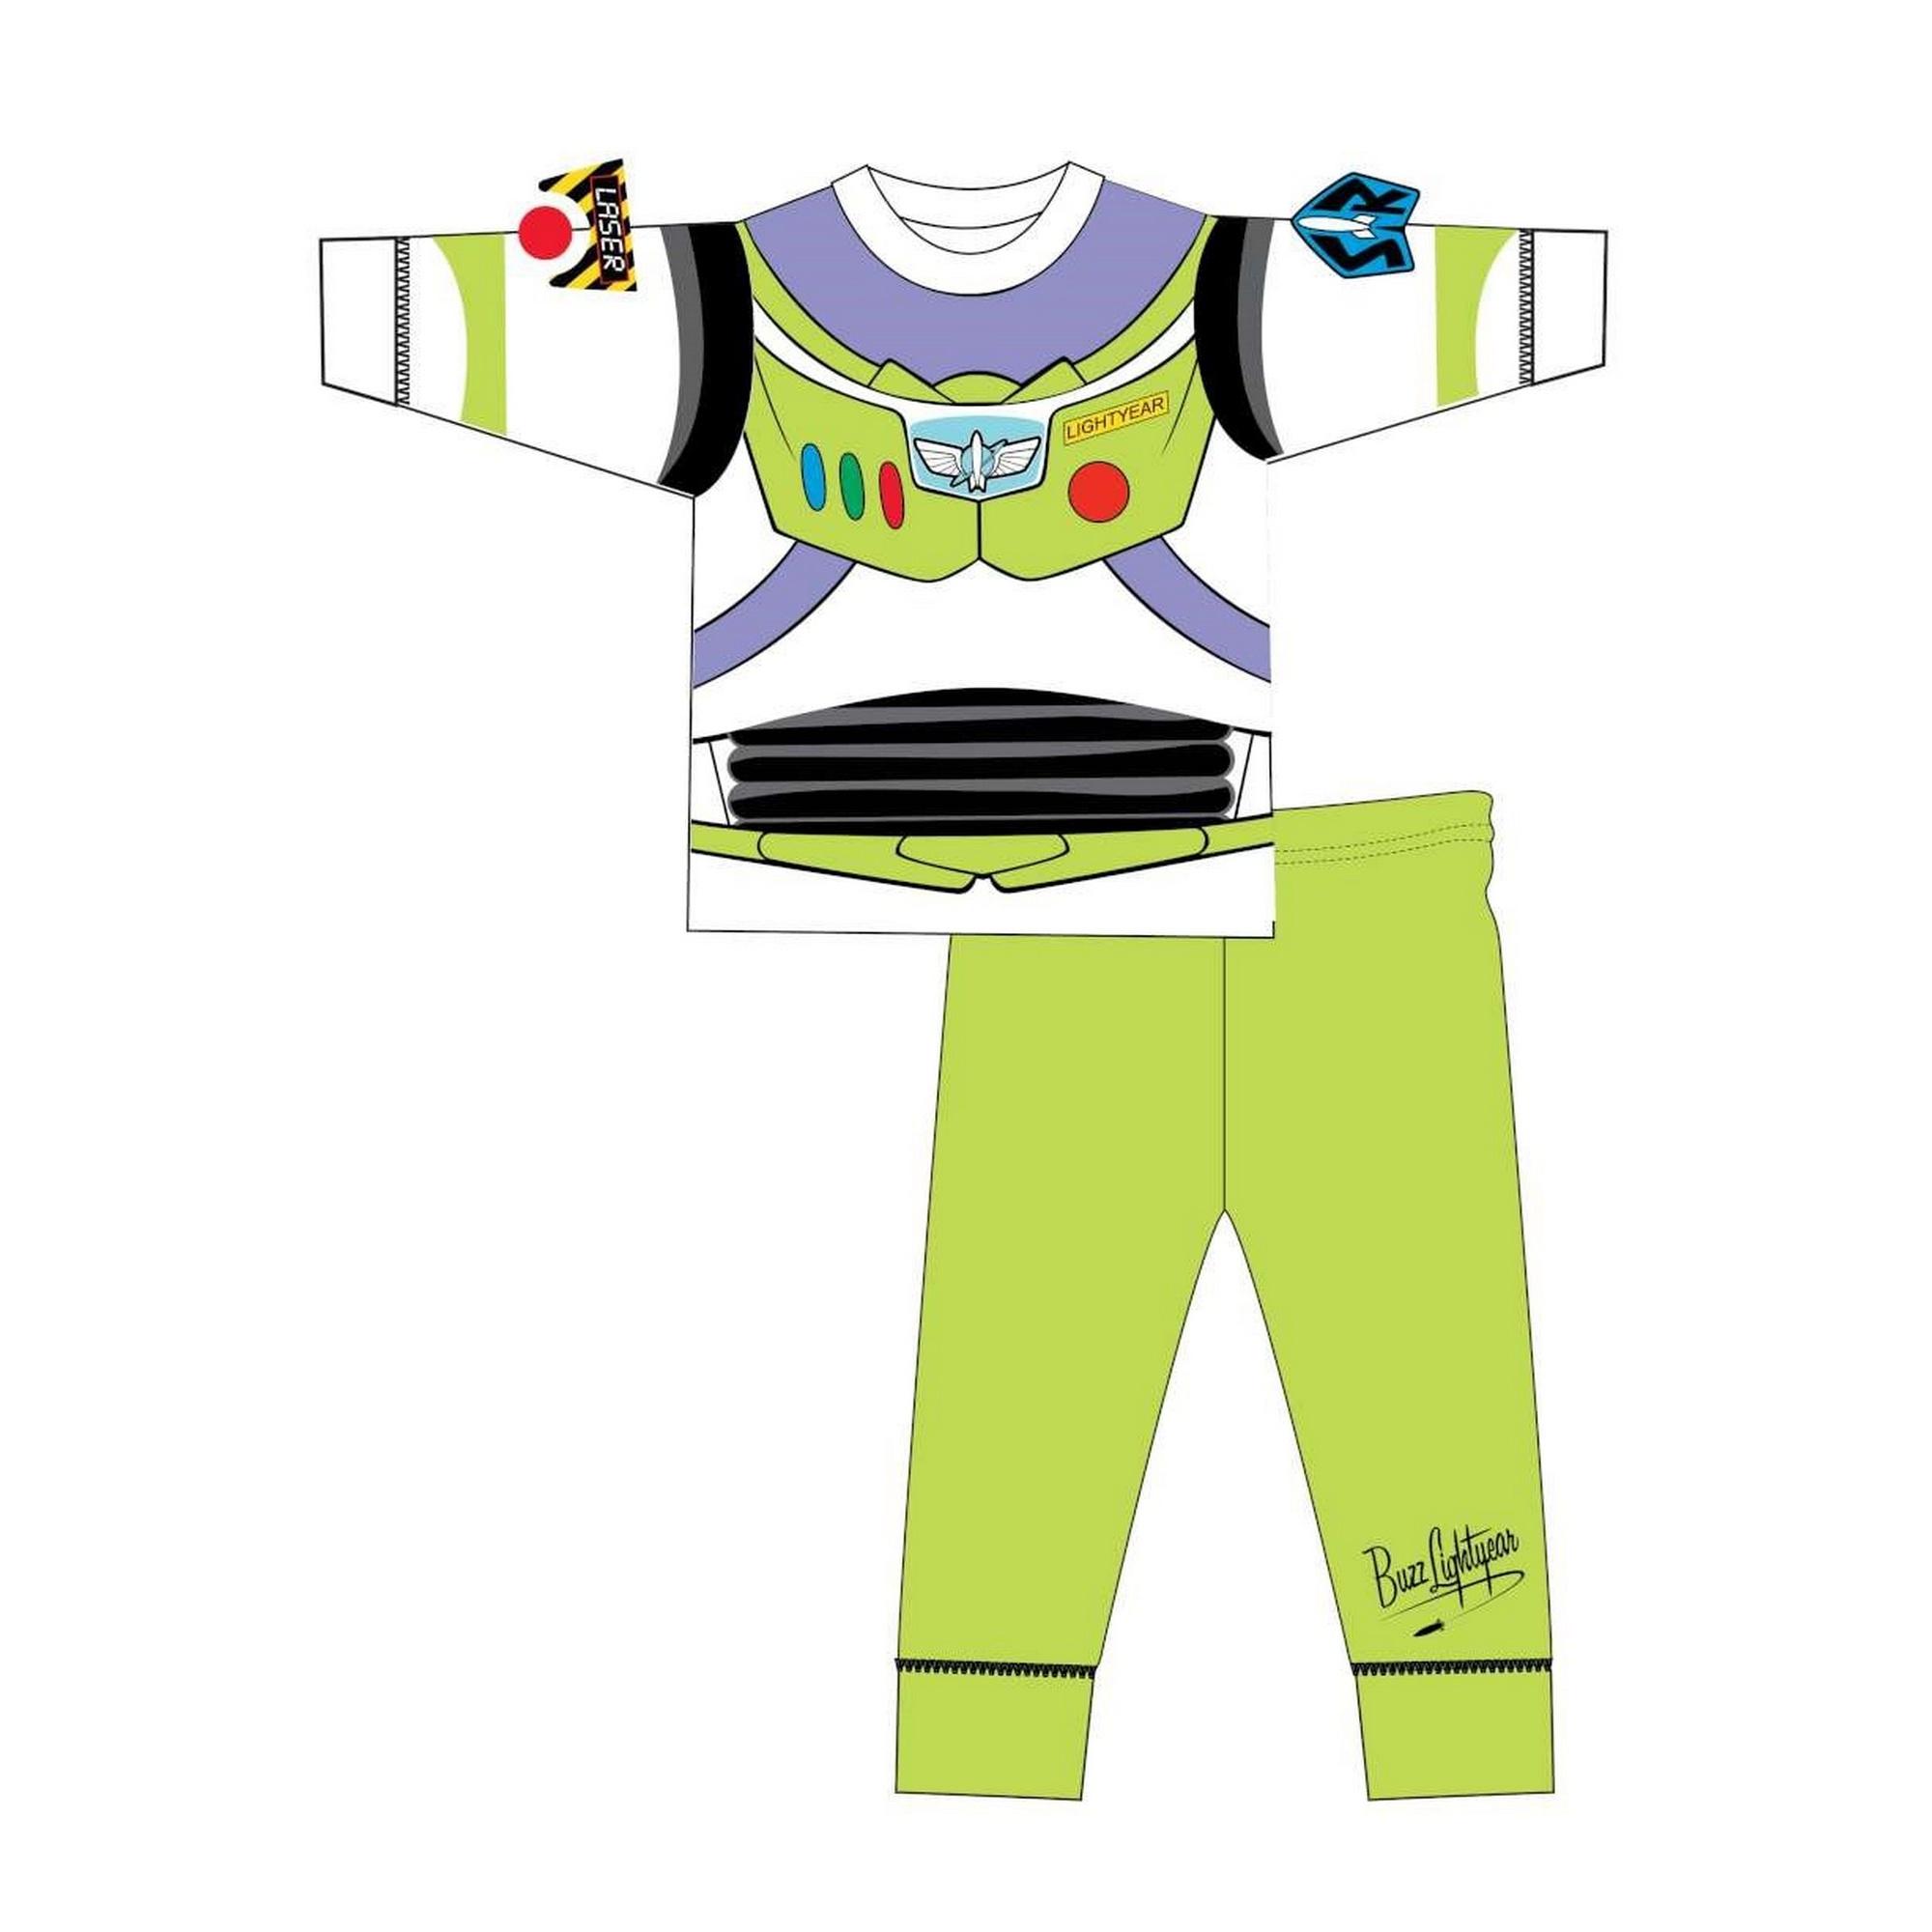 Toy-Story-Pijama-de-manga-larga-infantil-estilo-disfraz-de-Buzz-Lightyear